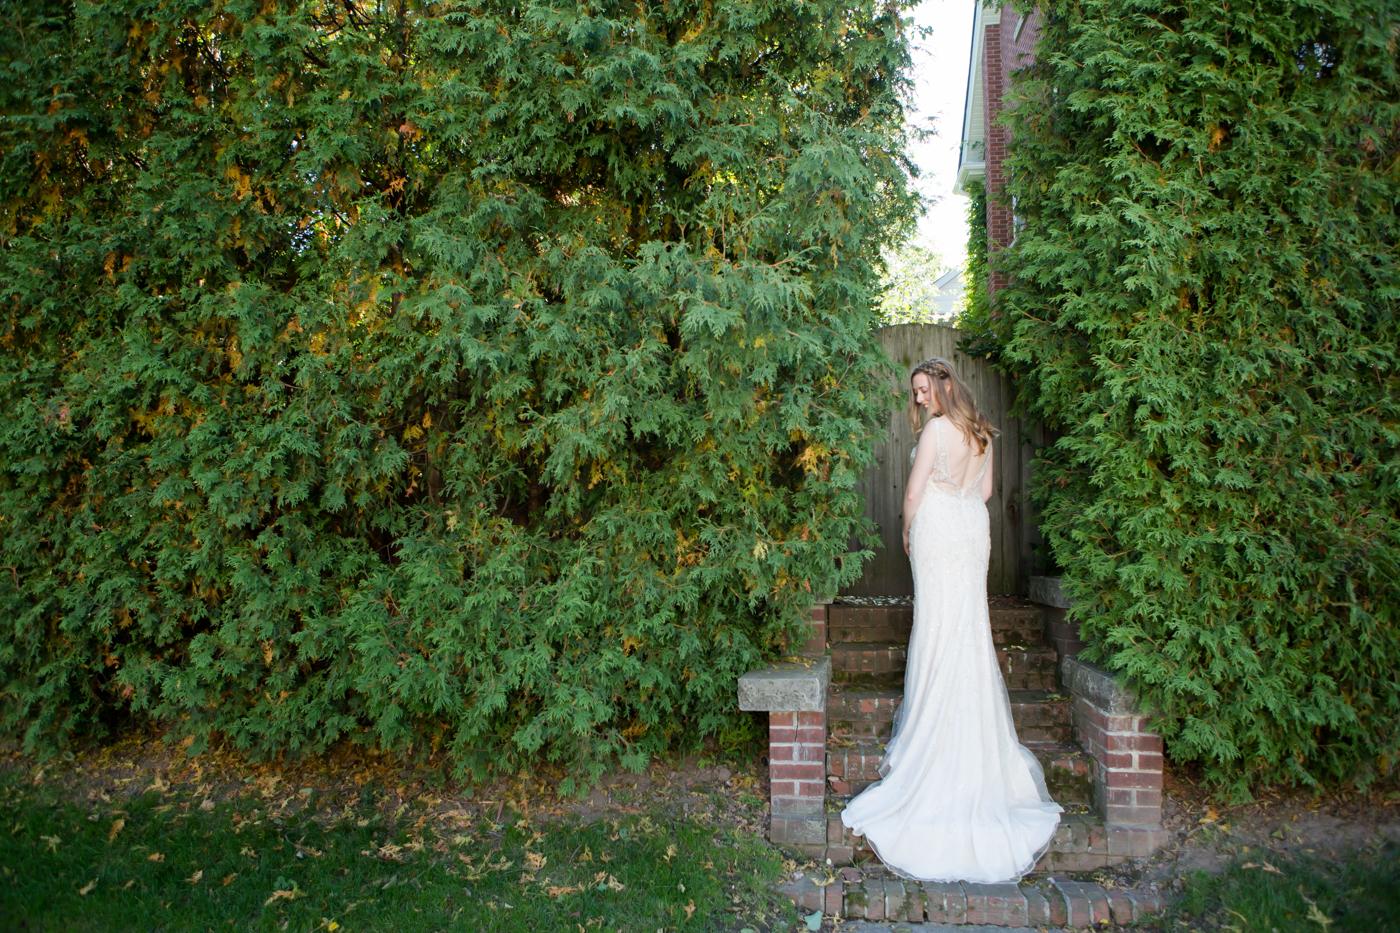 Sam+Amelio_Wedding_Allison Clark Photography-12